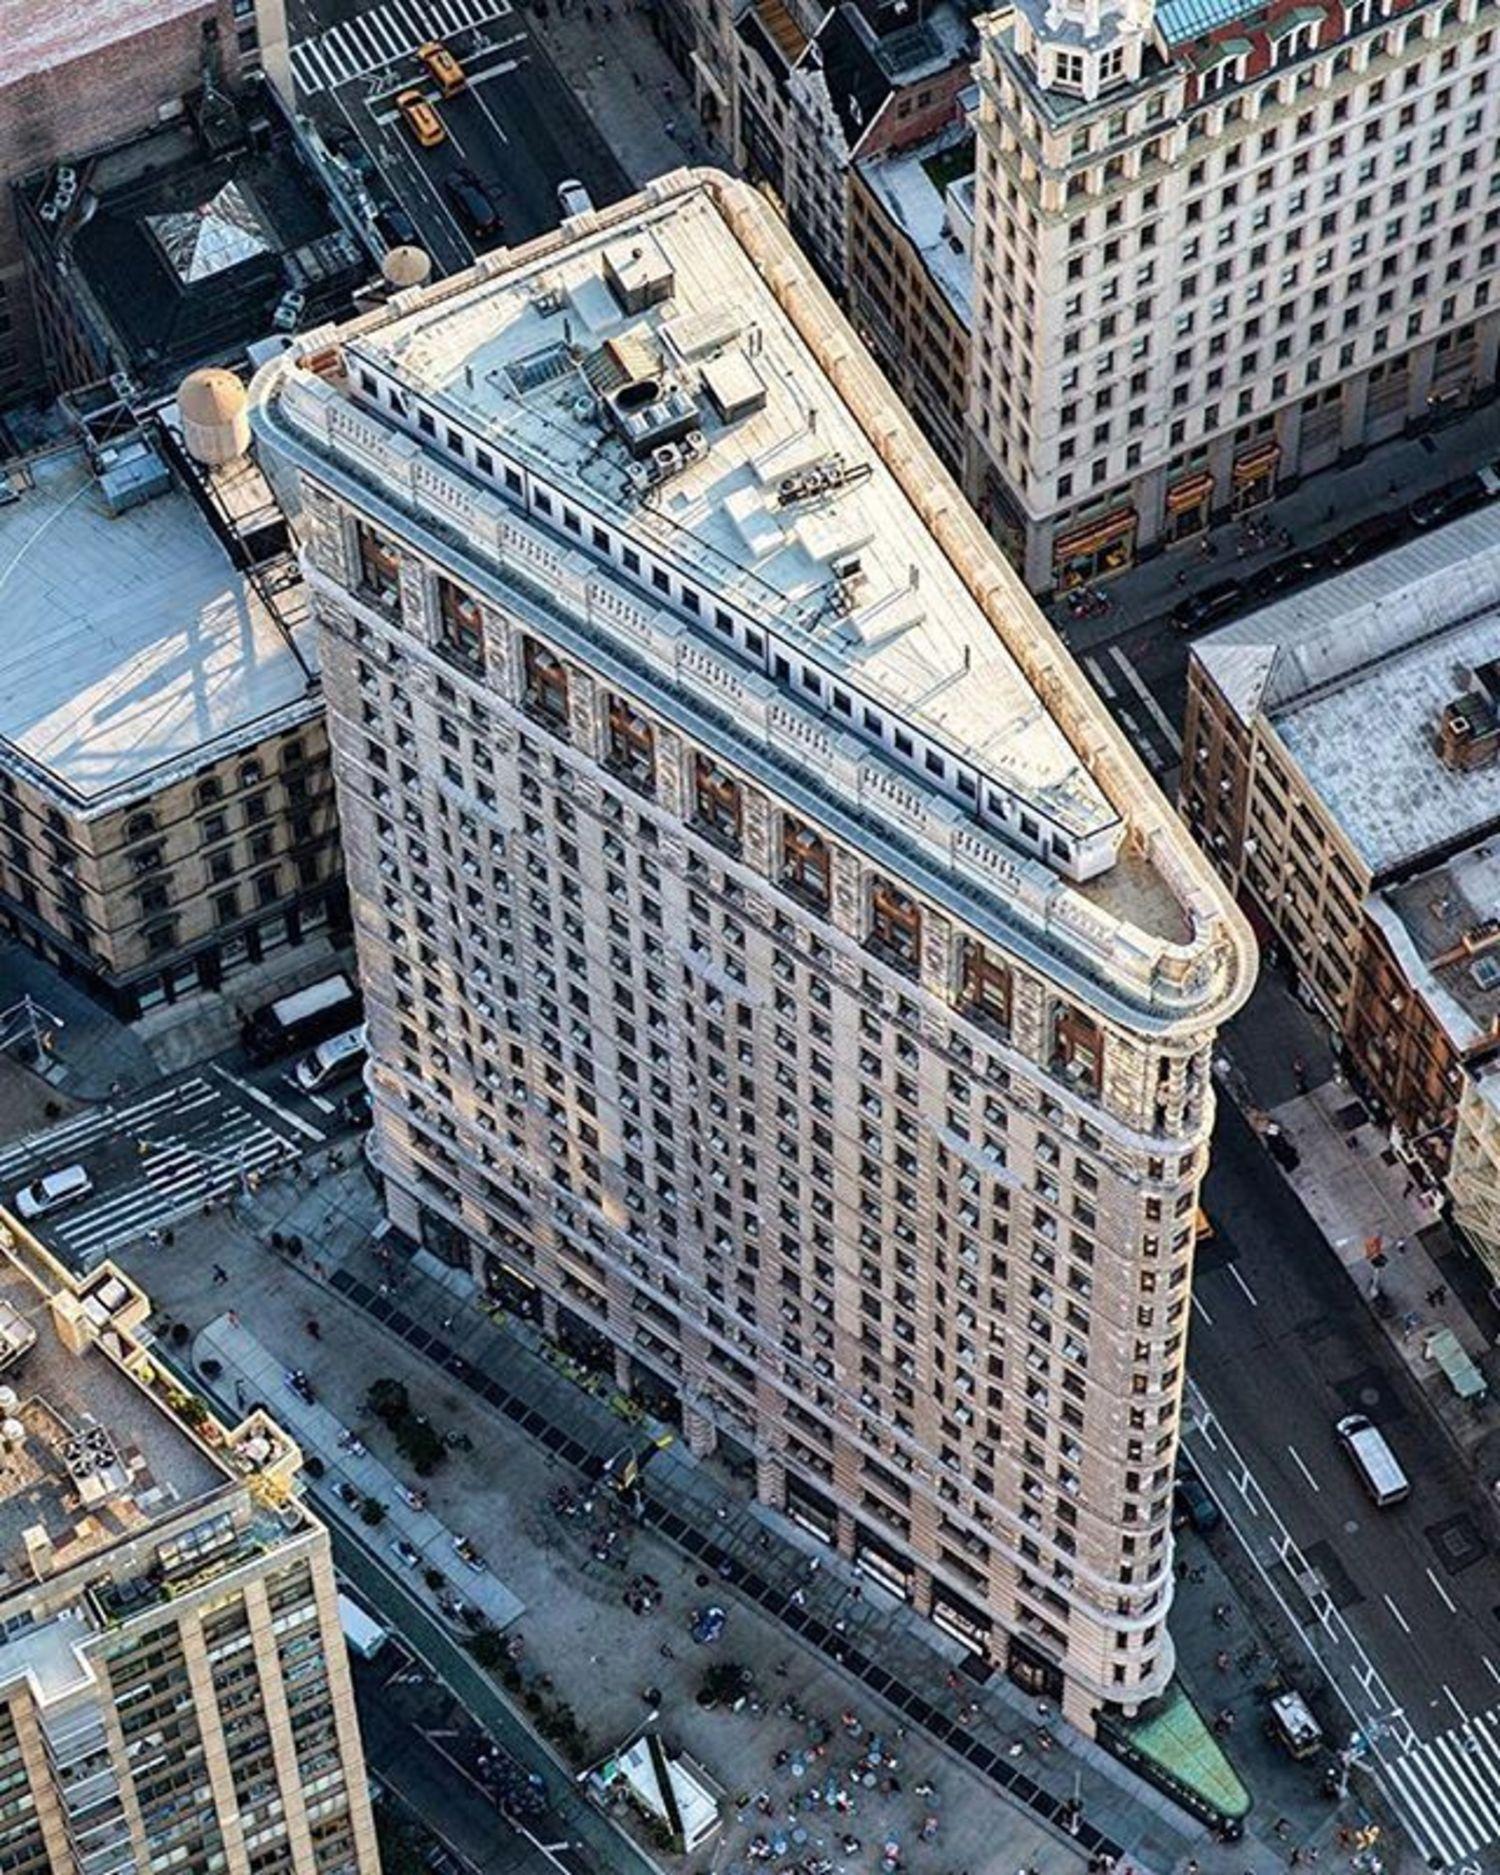 Flatiron Building, New York, New York. Photo via @mattpugs #viewingnyc #newyork #newyorkcity #nyc